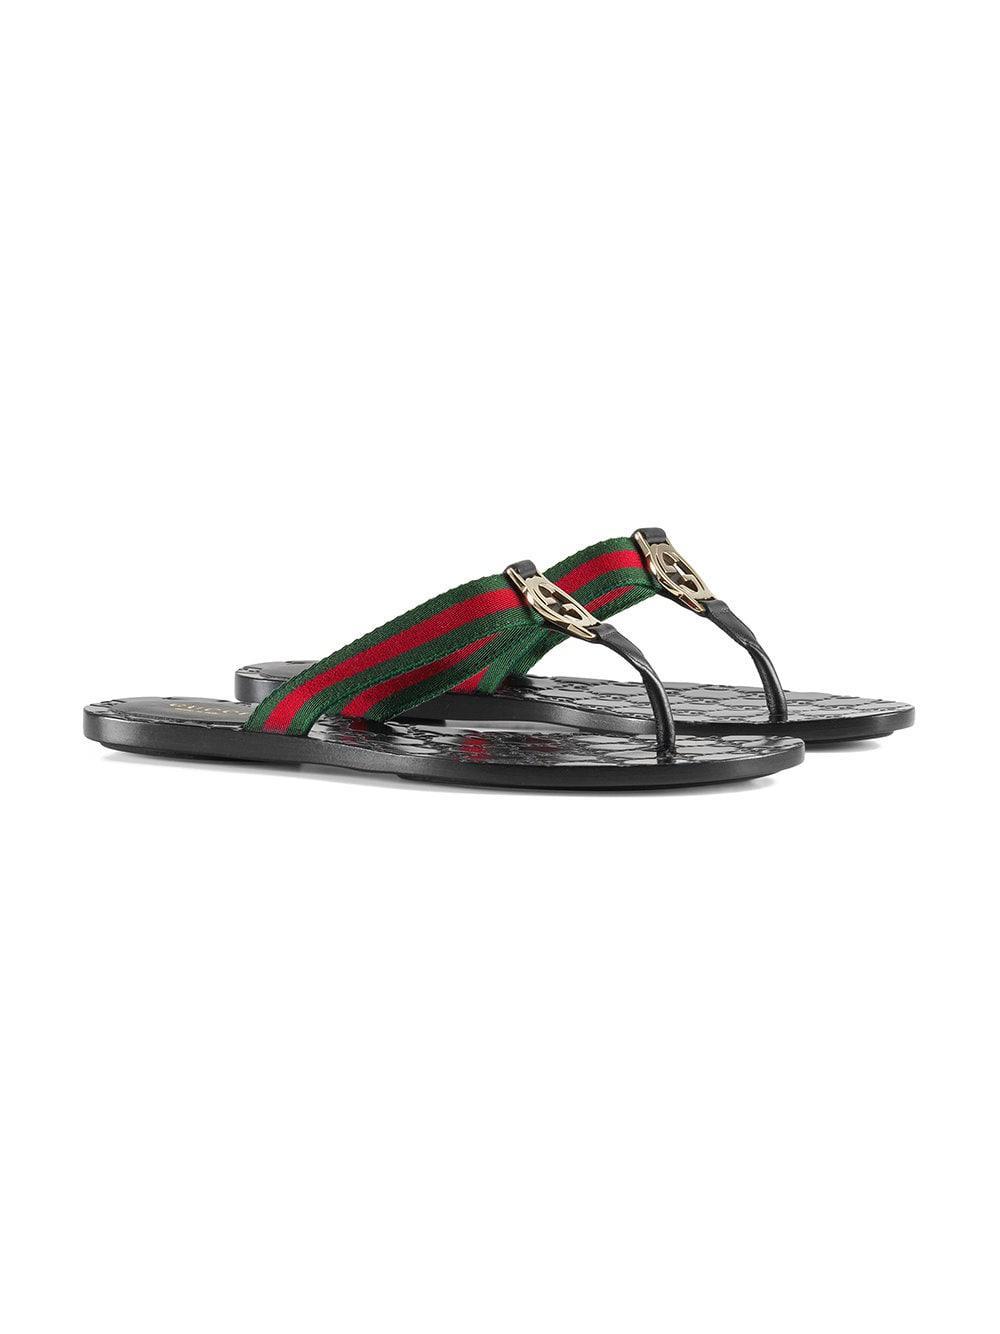 5cdc2abf83ea Lyst - Gucci GG Thong Web Sandal in Black